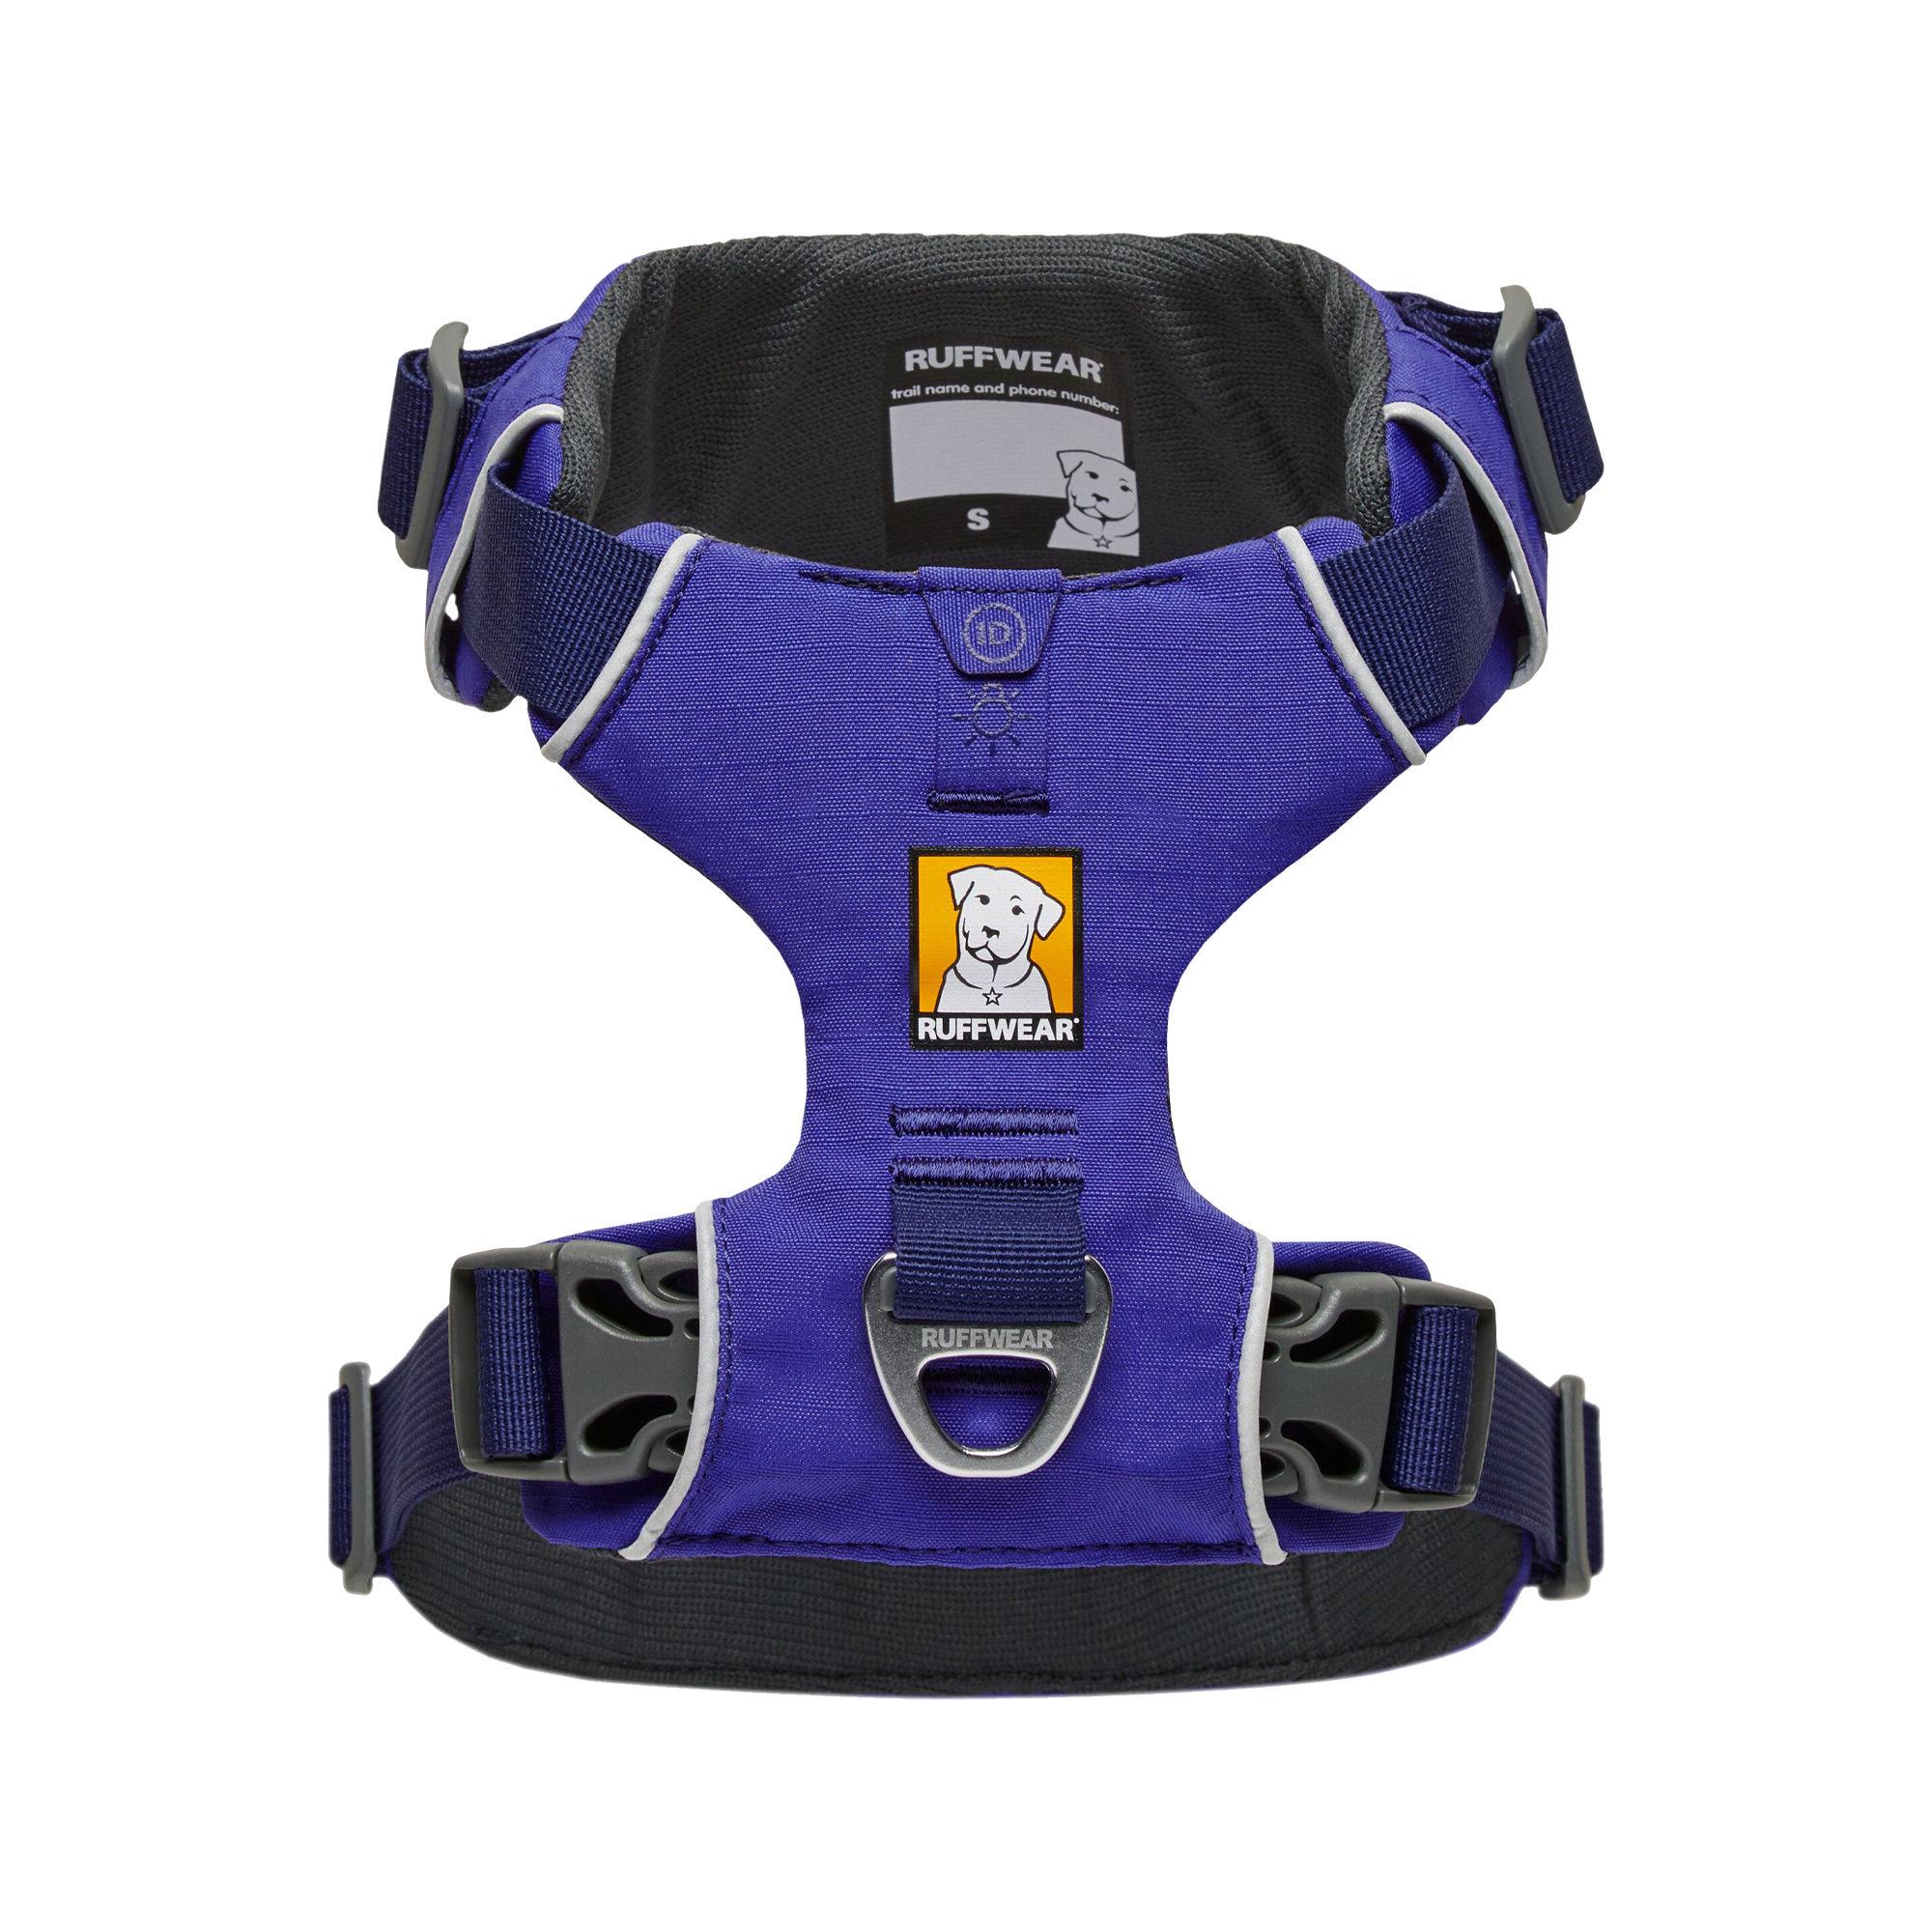 Ruffwear Front Range Harness - Huckleberry Blue